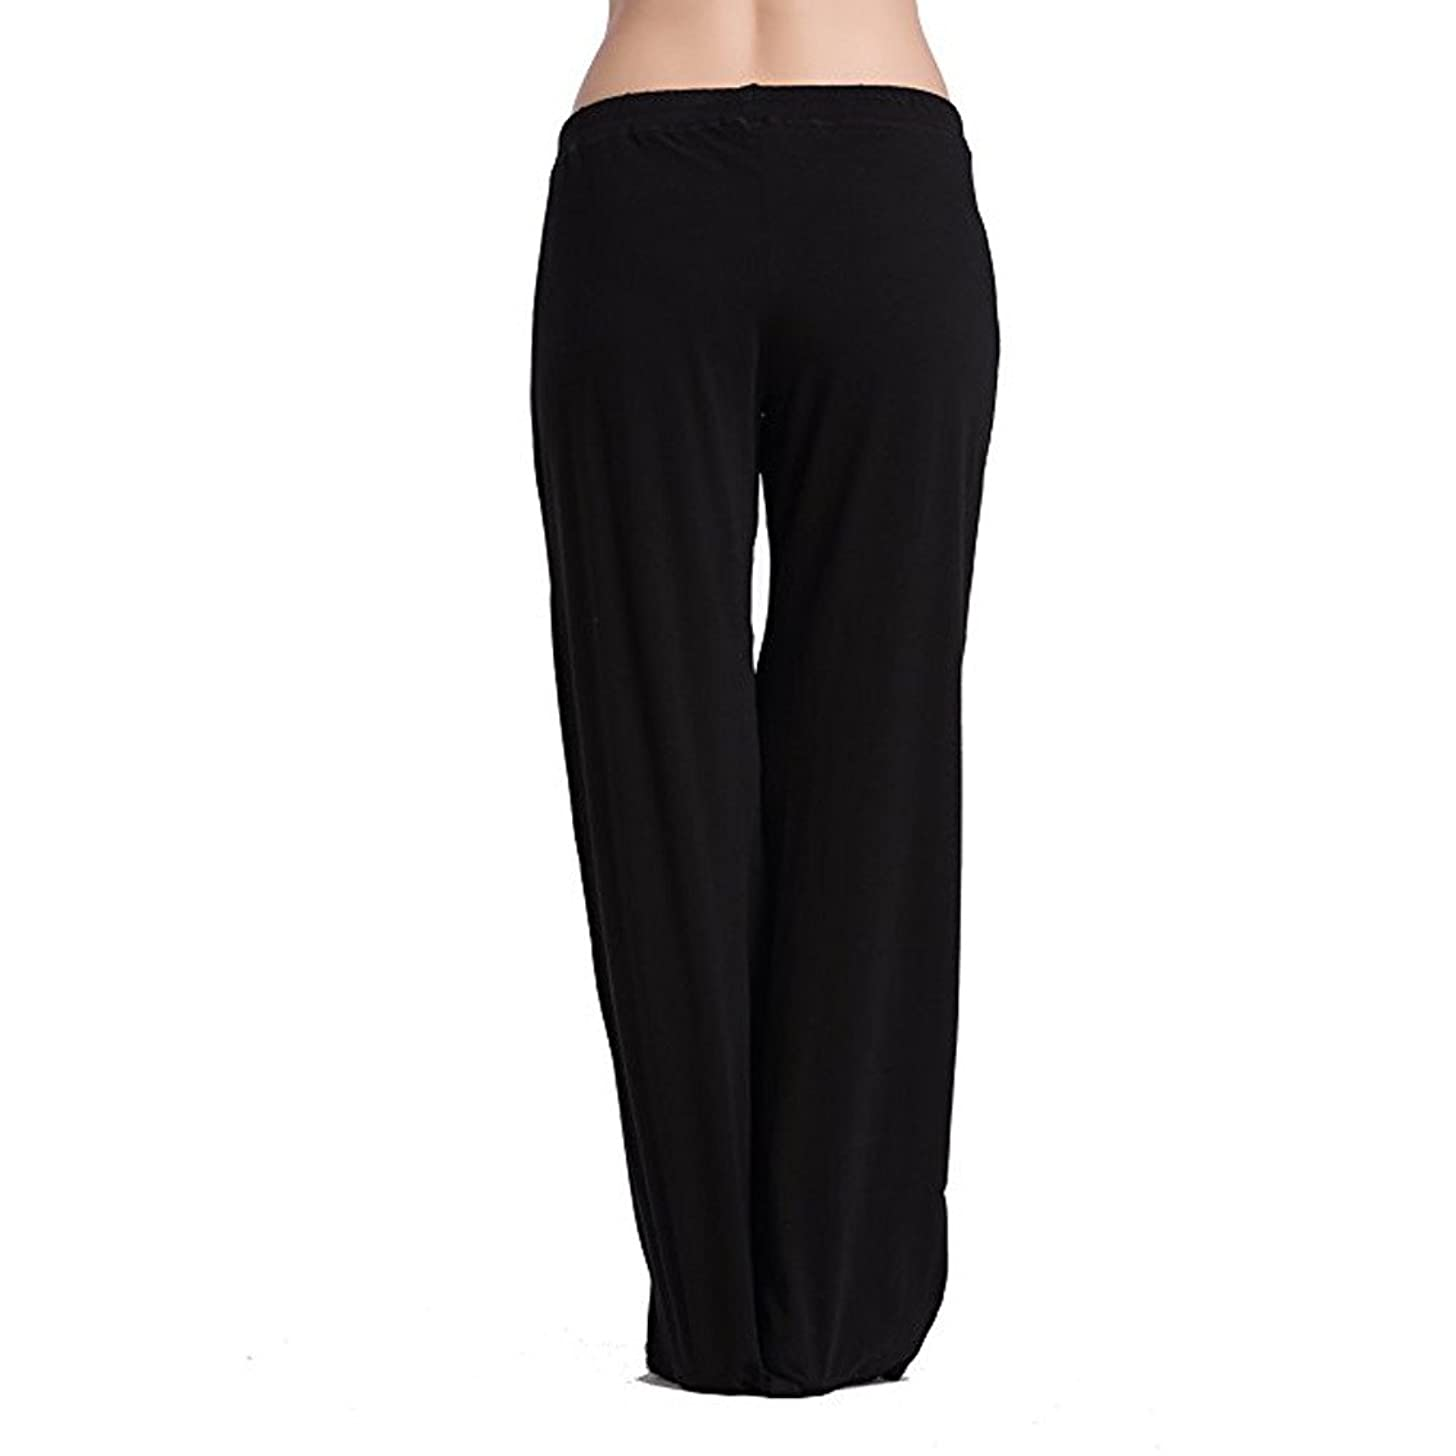 Yoga Pants for Women Gibobby 2019 Fashion Stretch Elastic Soft Fit Casual Sleep Yoga Daily Pajama Pants Trousers Leggings